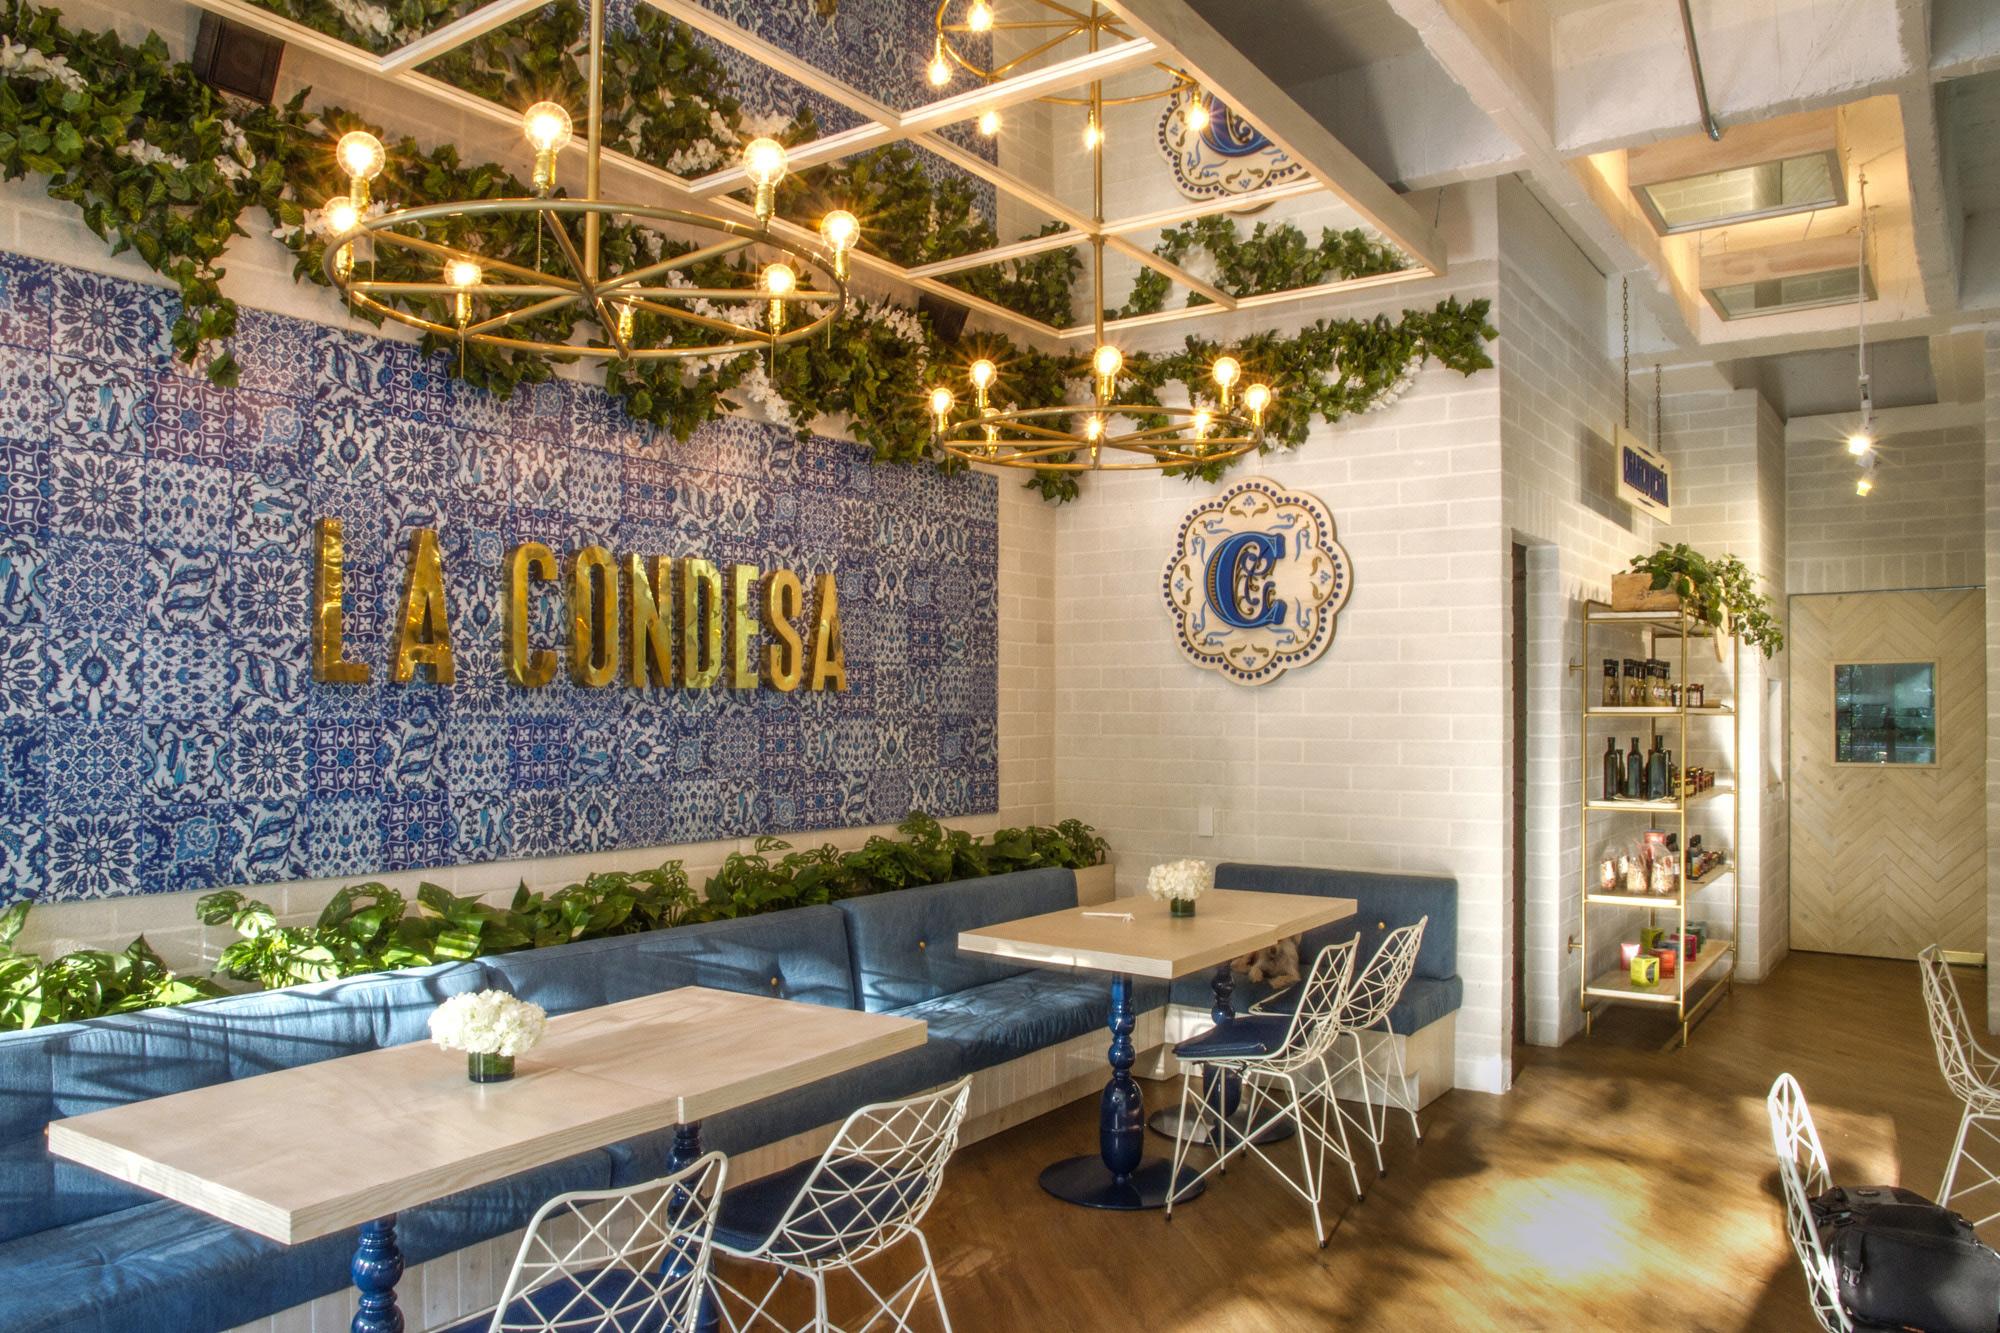 Interior Design for La Condesa. Designed by Plasma Nodo @enviromeant.com